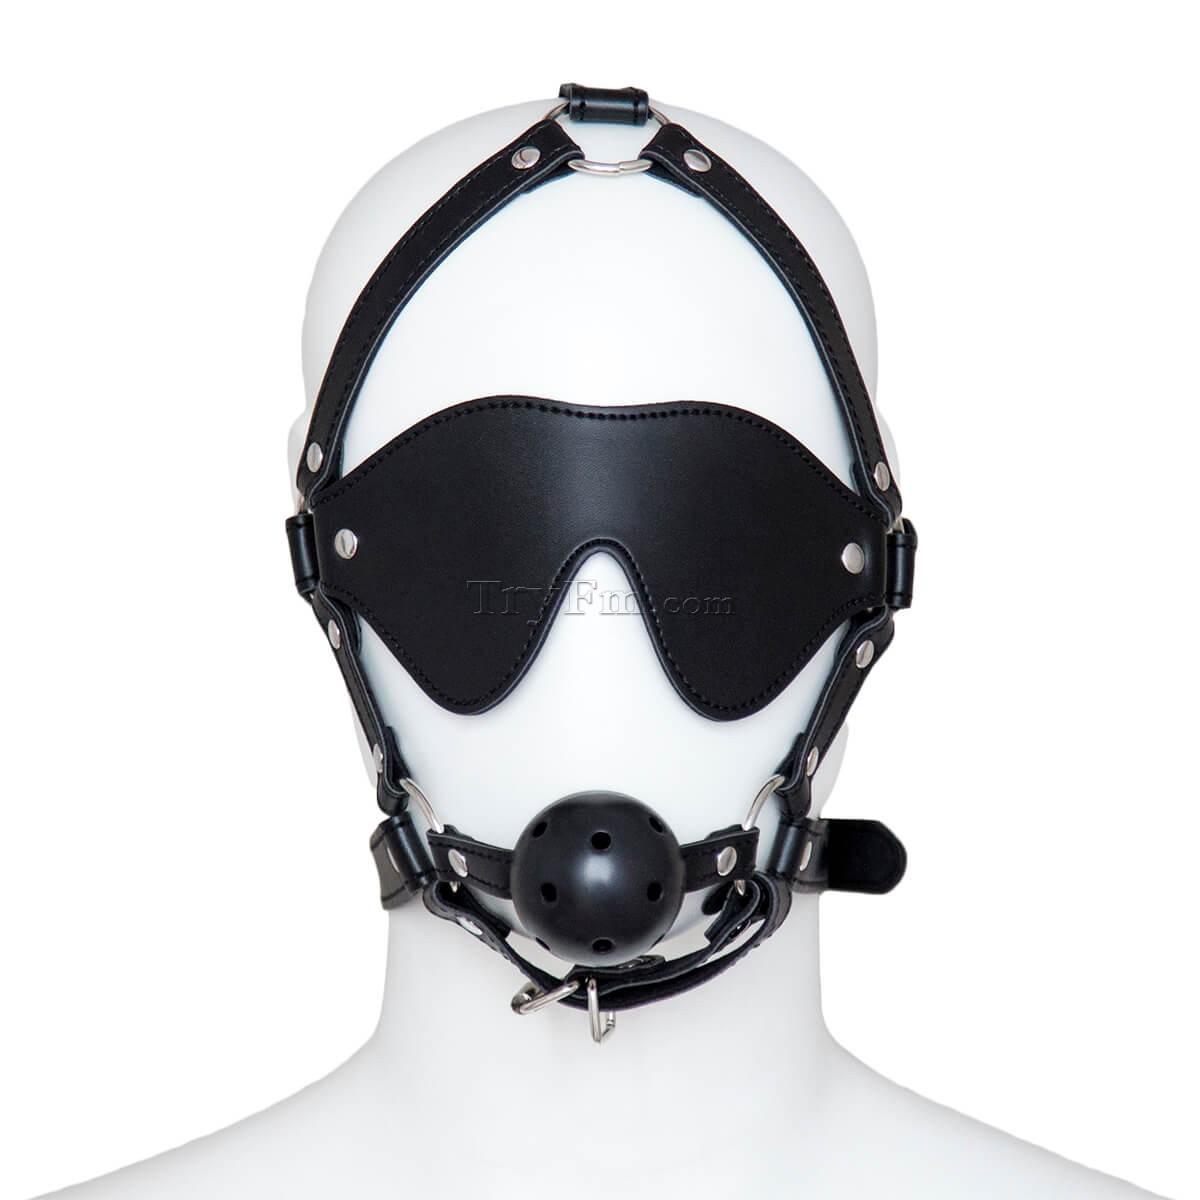 24-Blindfold-Harness-and-Ball-Gag-2.jpg